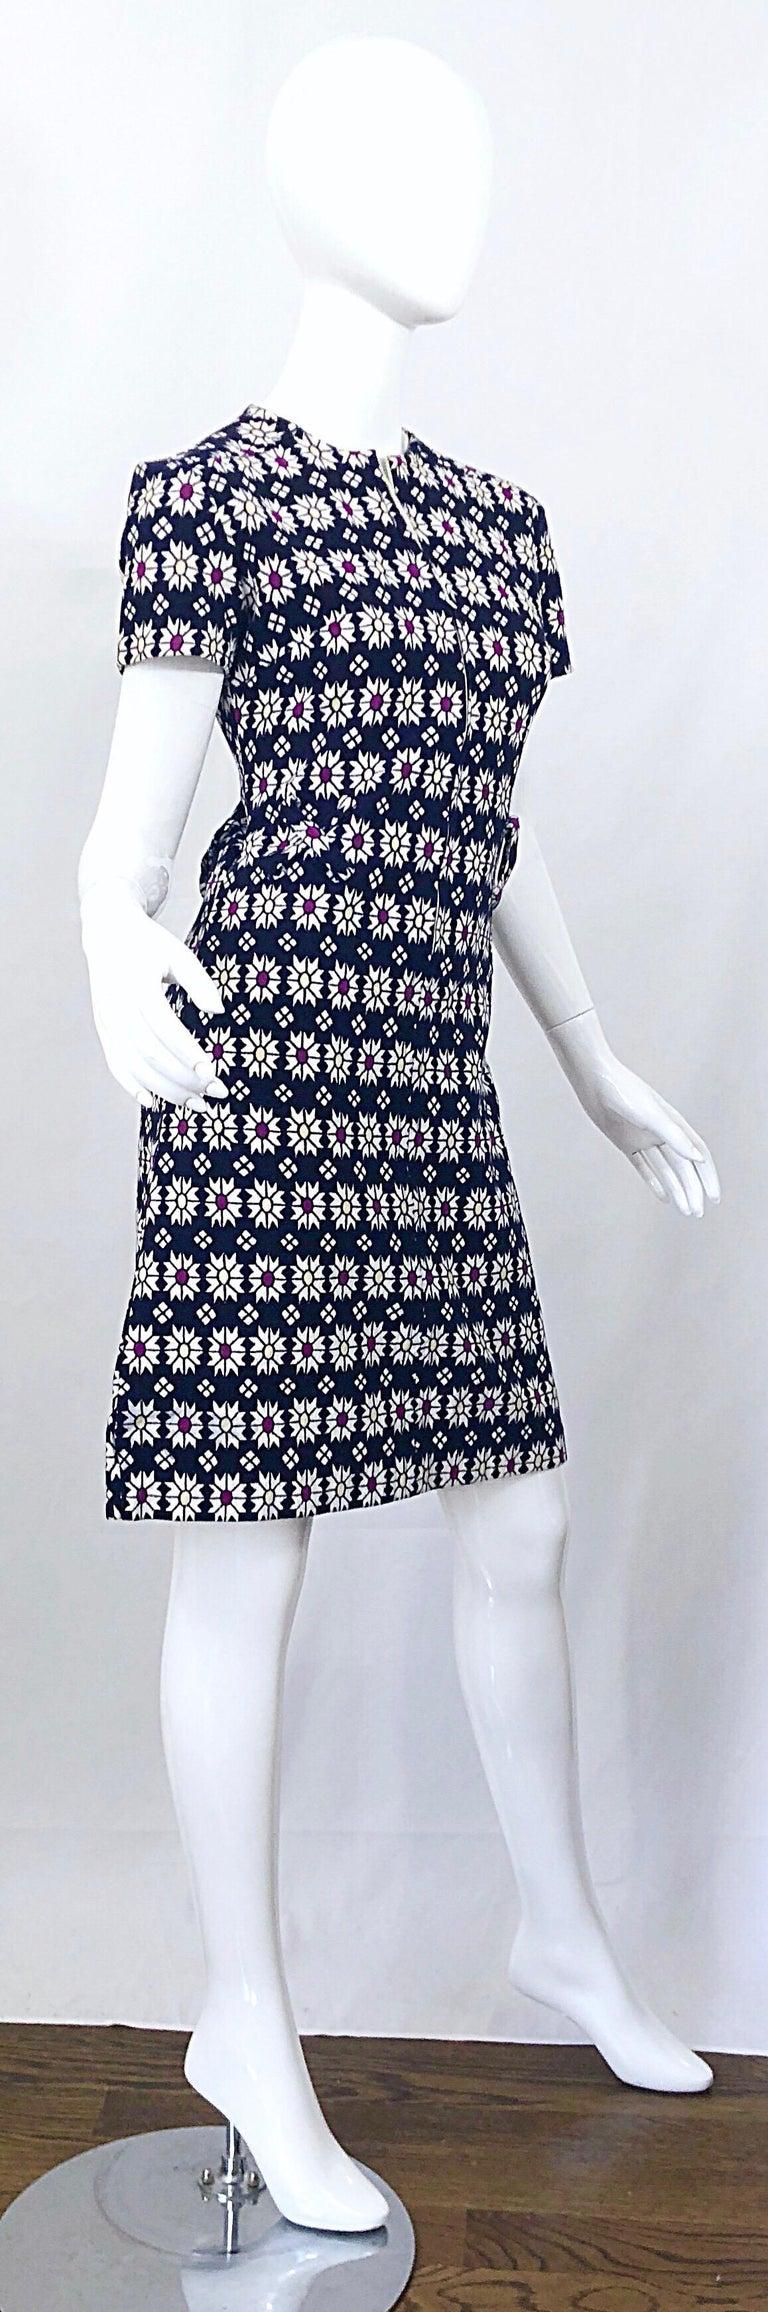 Chic 1960s Navy Blue + Fuchsia + Yellow Geometric Daisy Print 60s A Line Dress For Sale 9